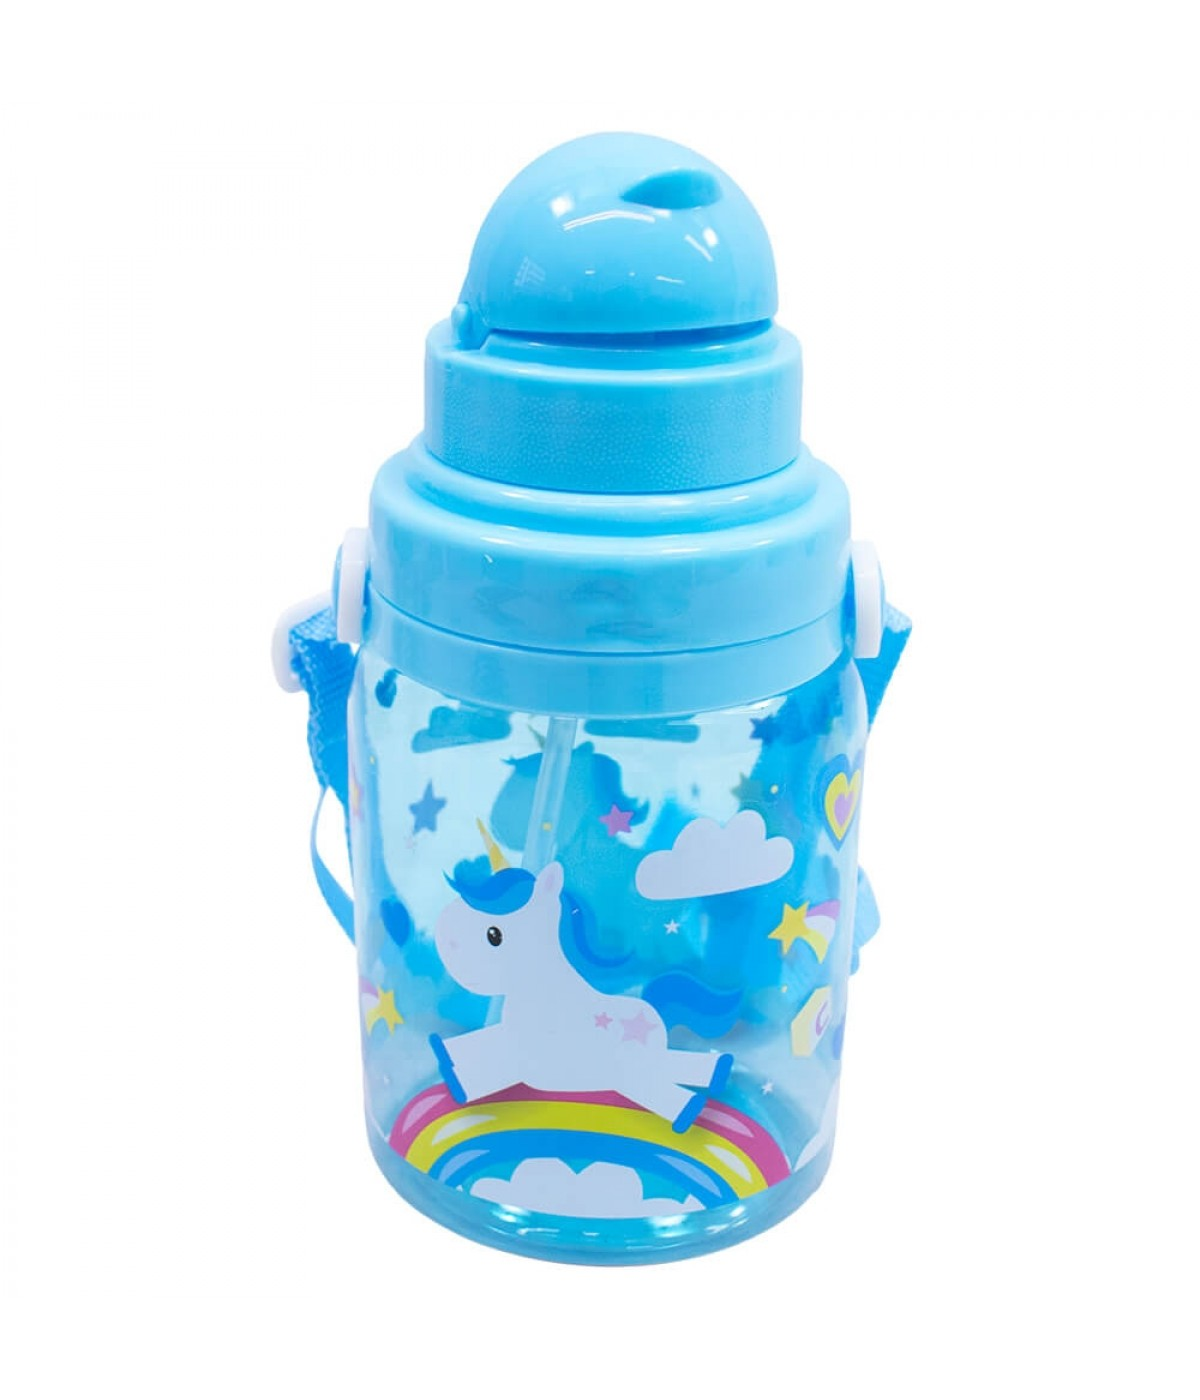 Garrafa Plástico Unicórnio Azul 600ml - Projeto Kiwi